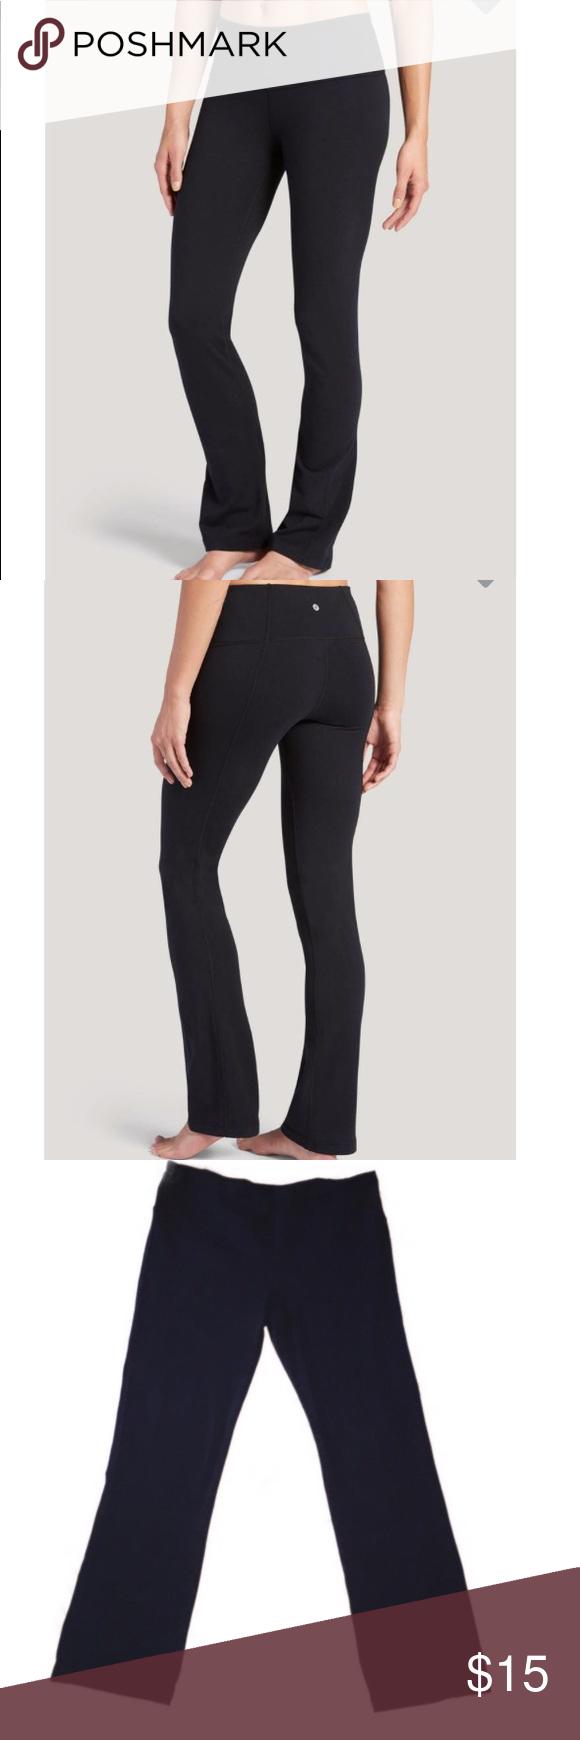 61846eb6b71c3 NWOT Jockey Stretch Slim Bootleg Pants NWOT The Jockey Cotton Stretch Slim  Bootleg women's activewear pants